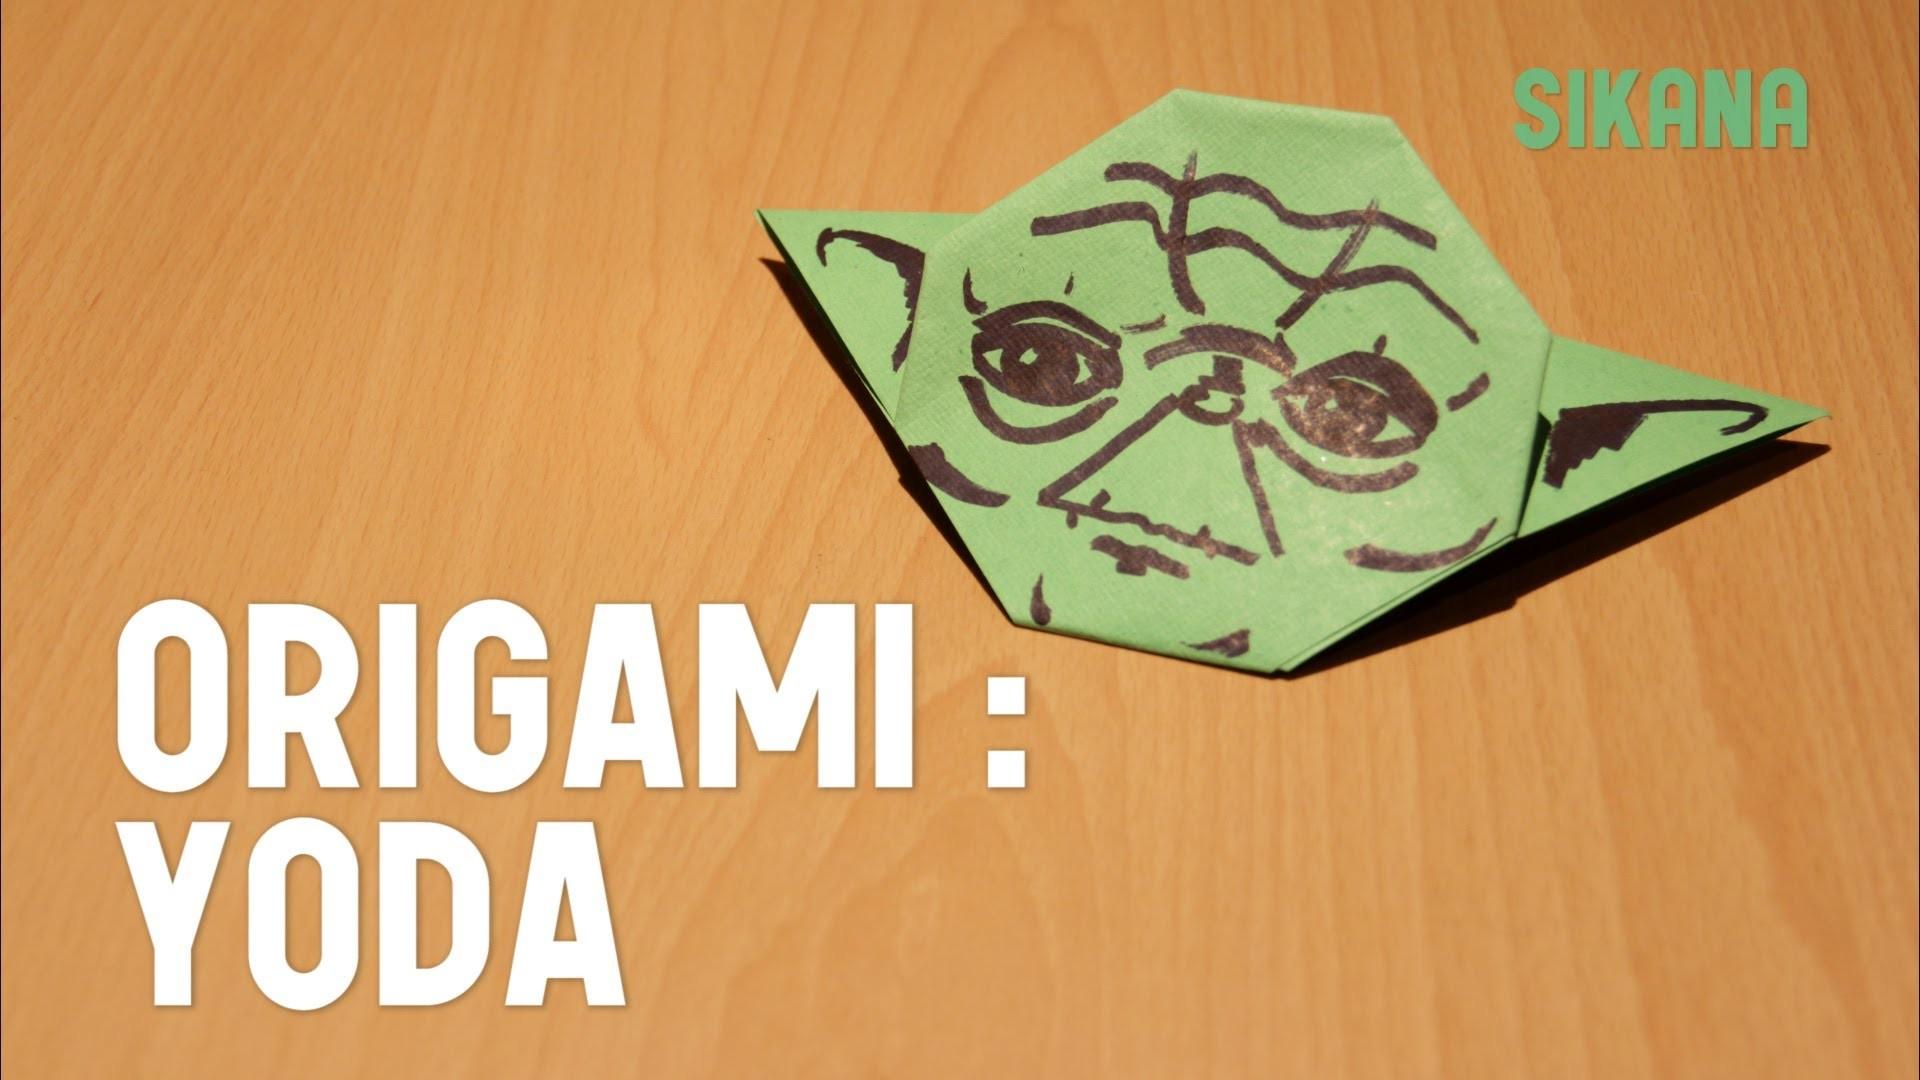 Origami : Faire un origami de Yoda - HD